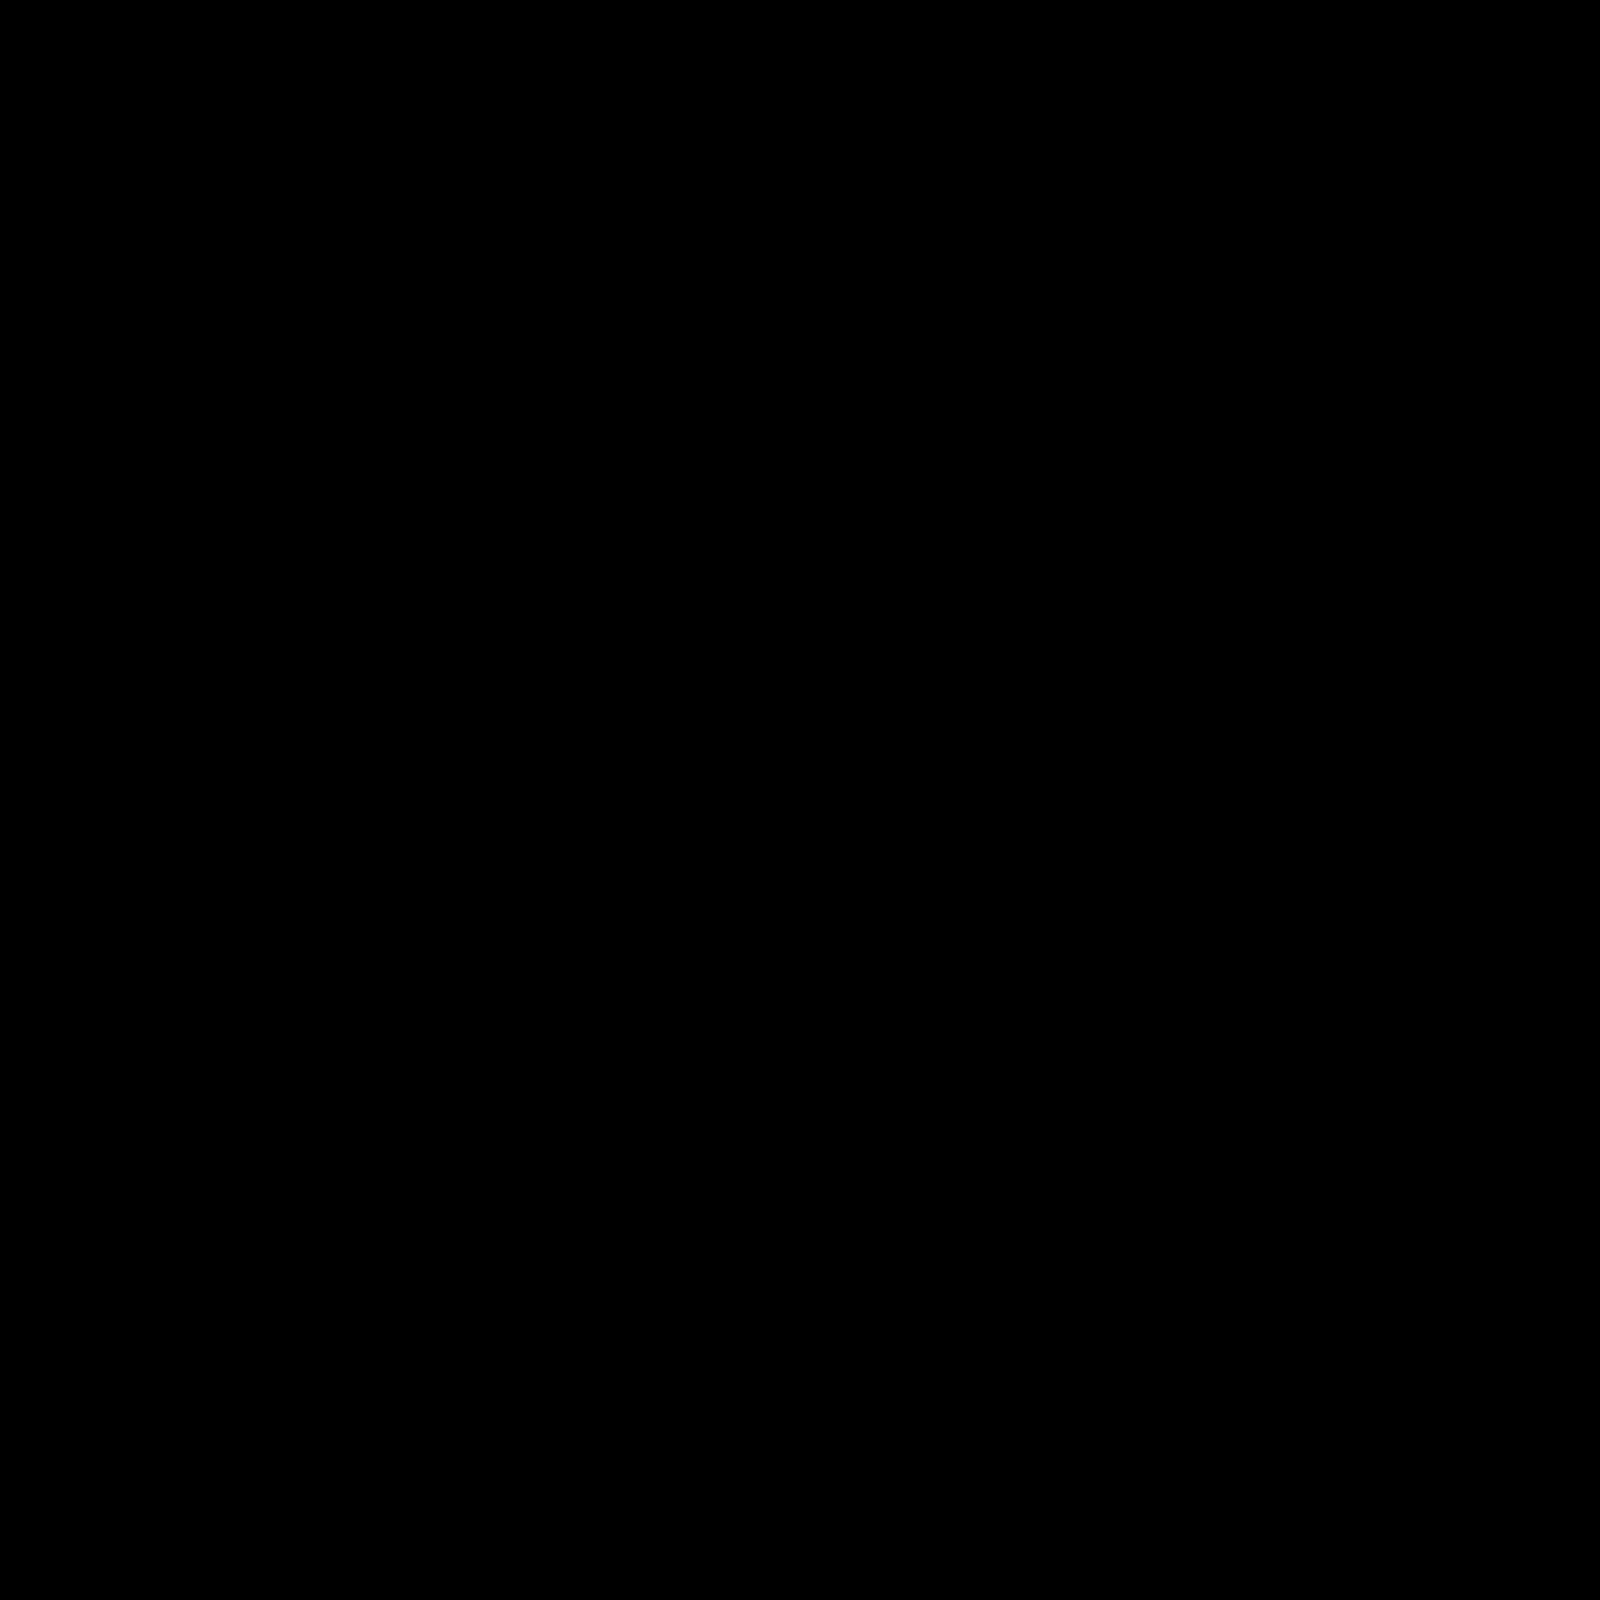 Life Cycle icon